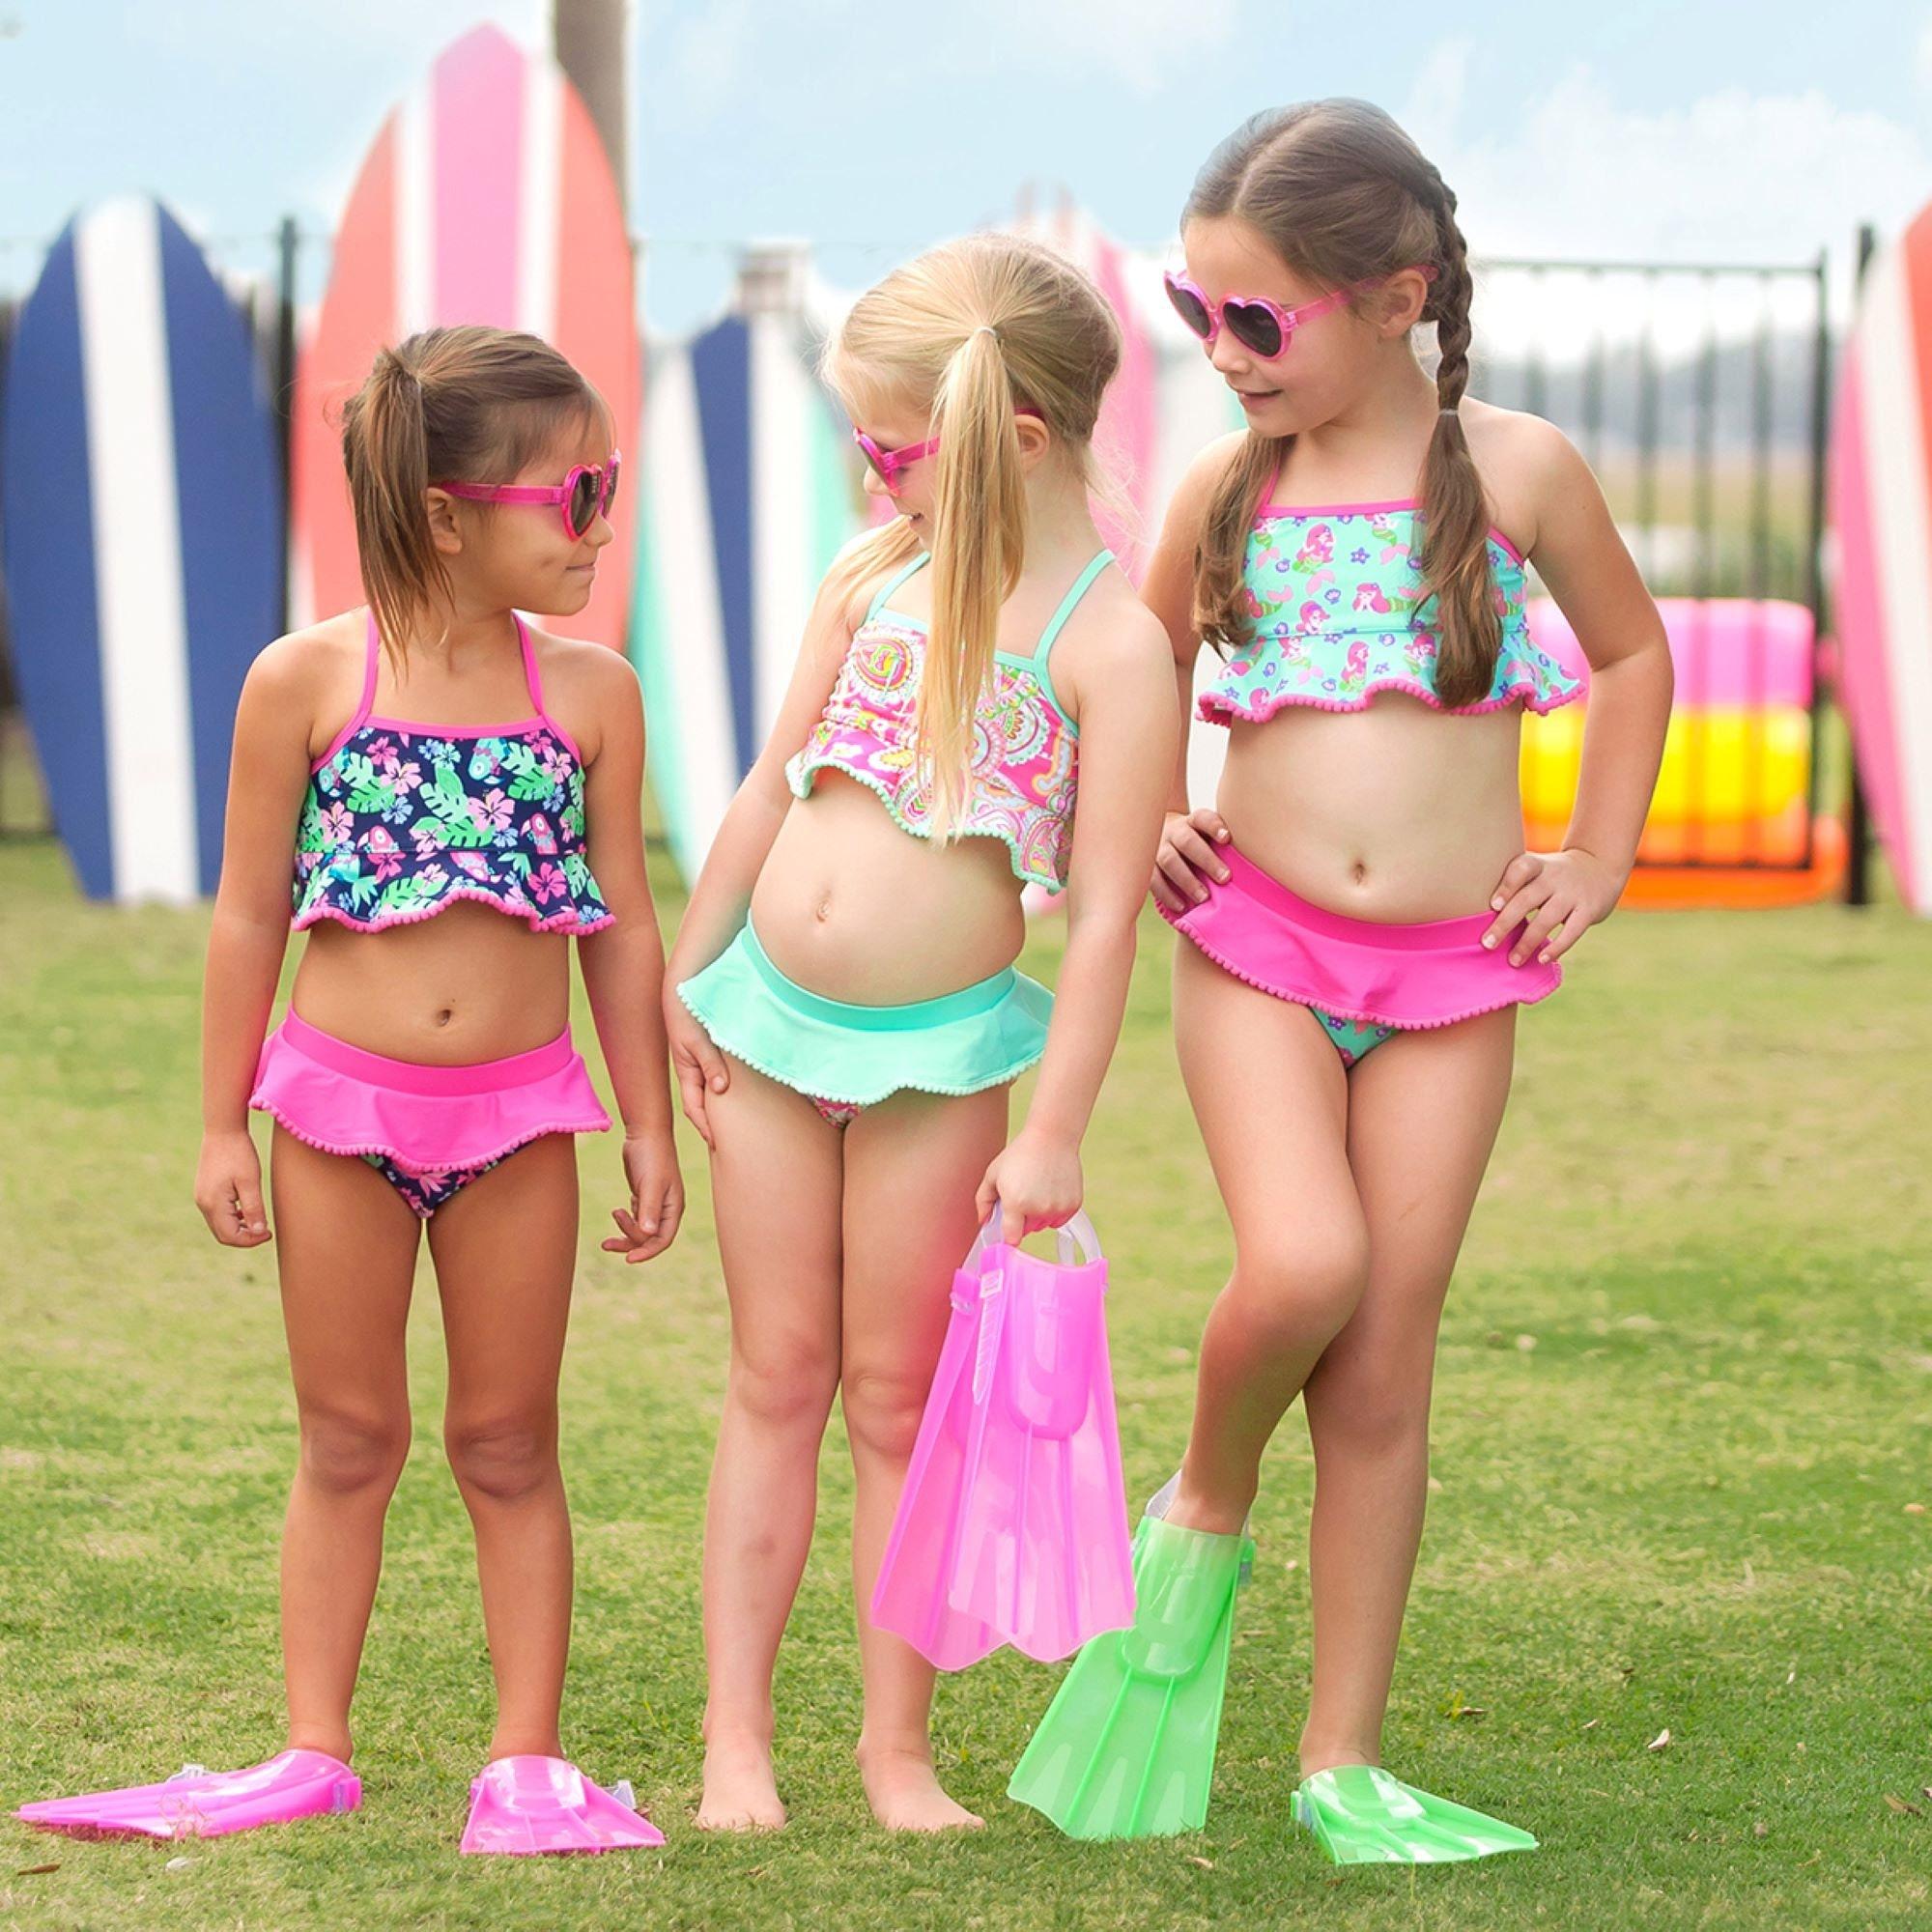 Girl/'s Swim 2 Piece Set Personalized Girls Suit Monogrammed Girls Bikini Swim Suit Set